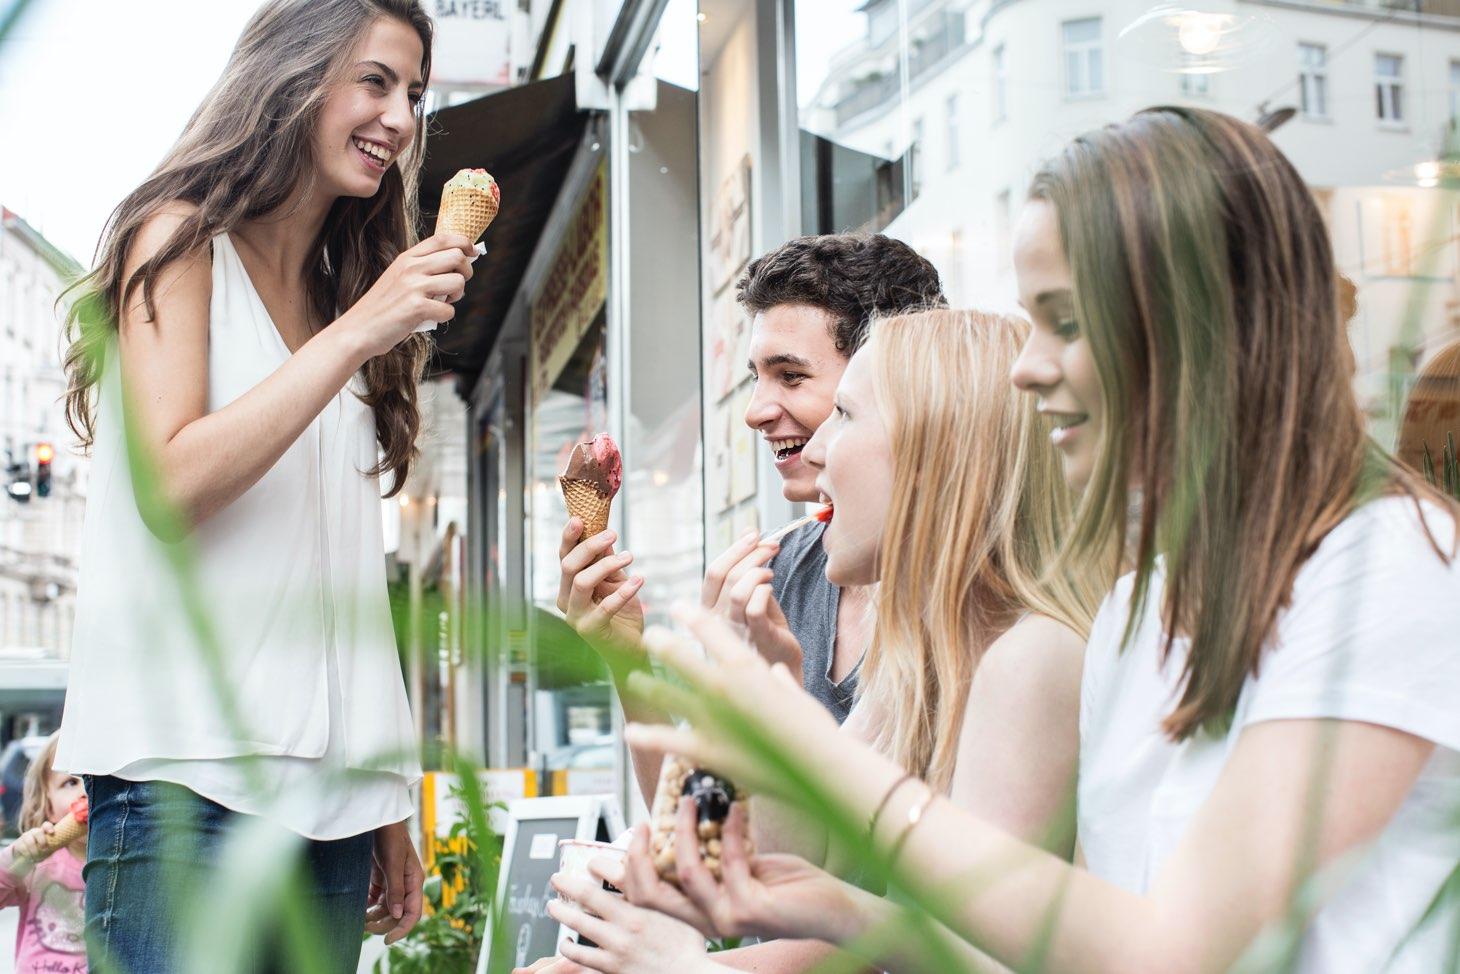 Gruppe Jugendlicher genießt Leones Eis vor dem Shop in der Langegasse im Sommer